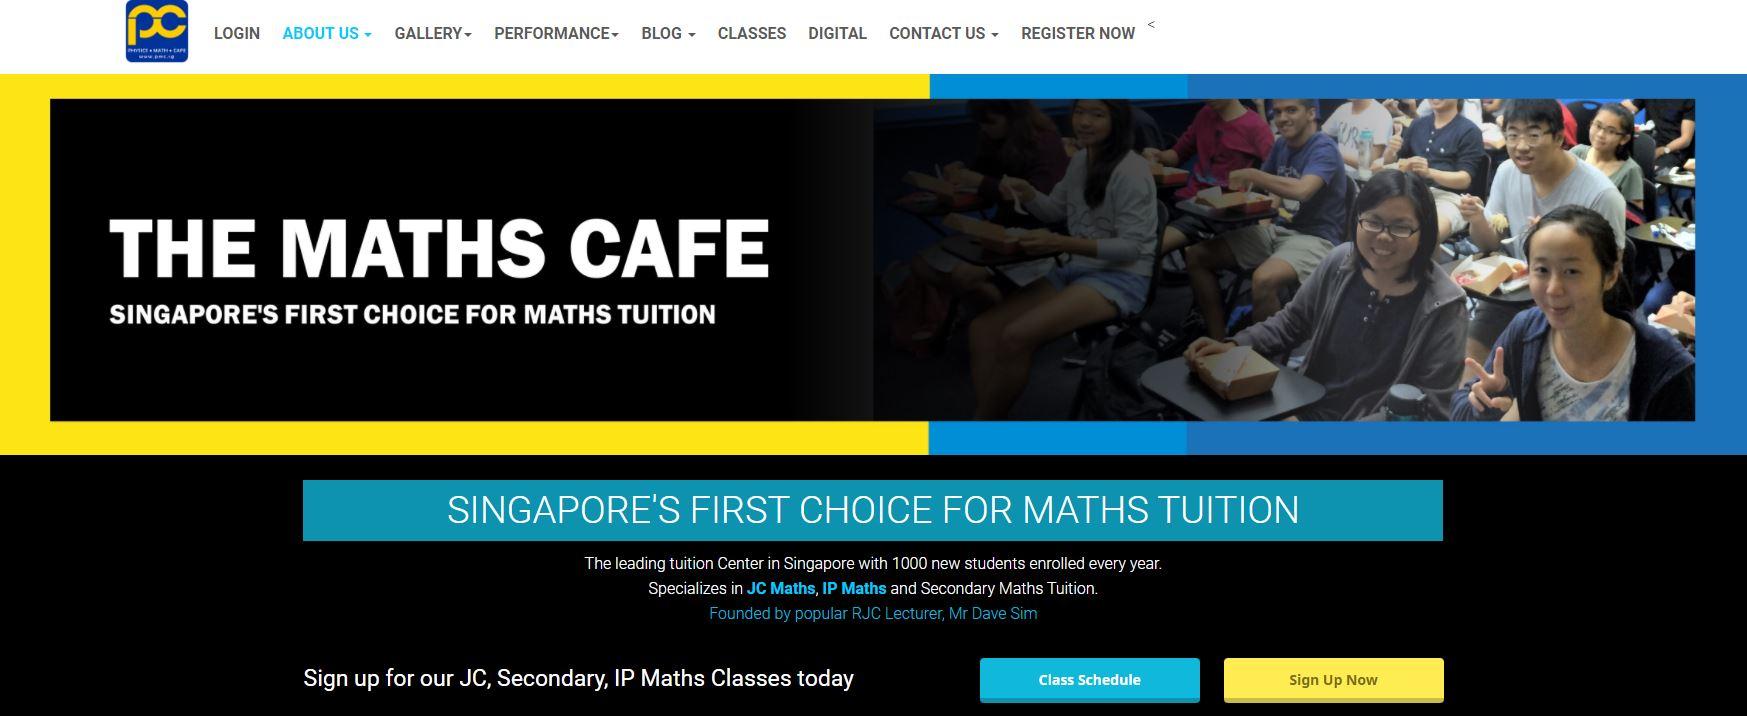 The-Maths-Cafe-Maths-Tuition